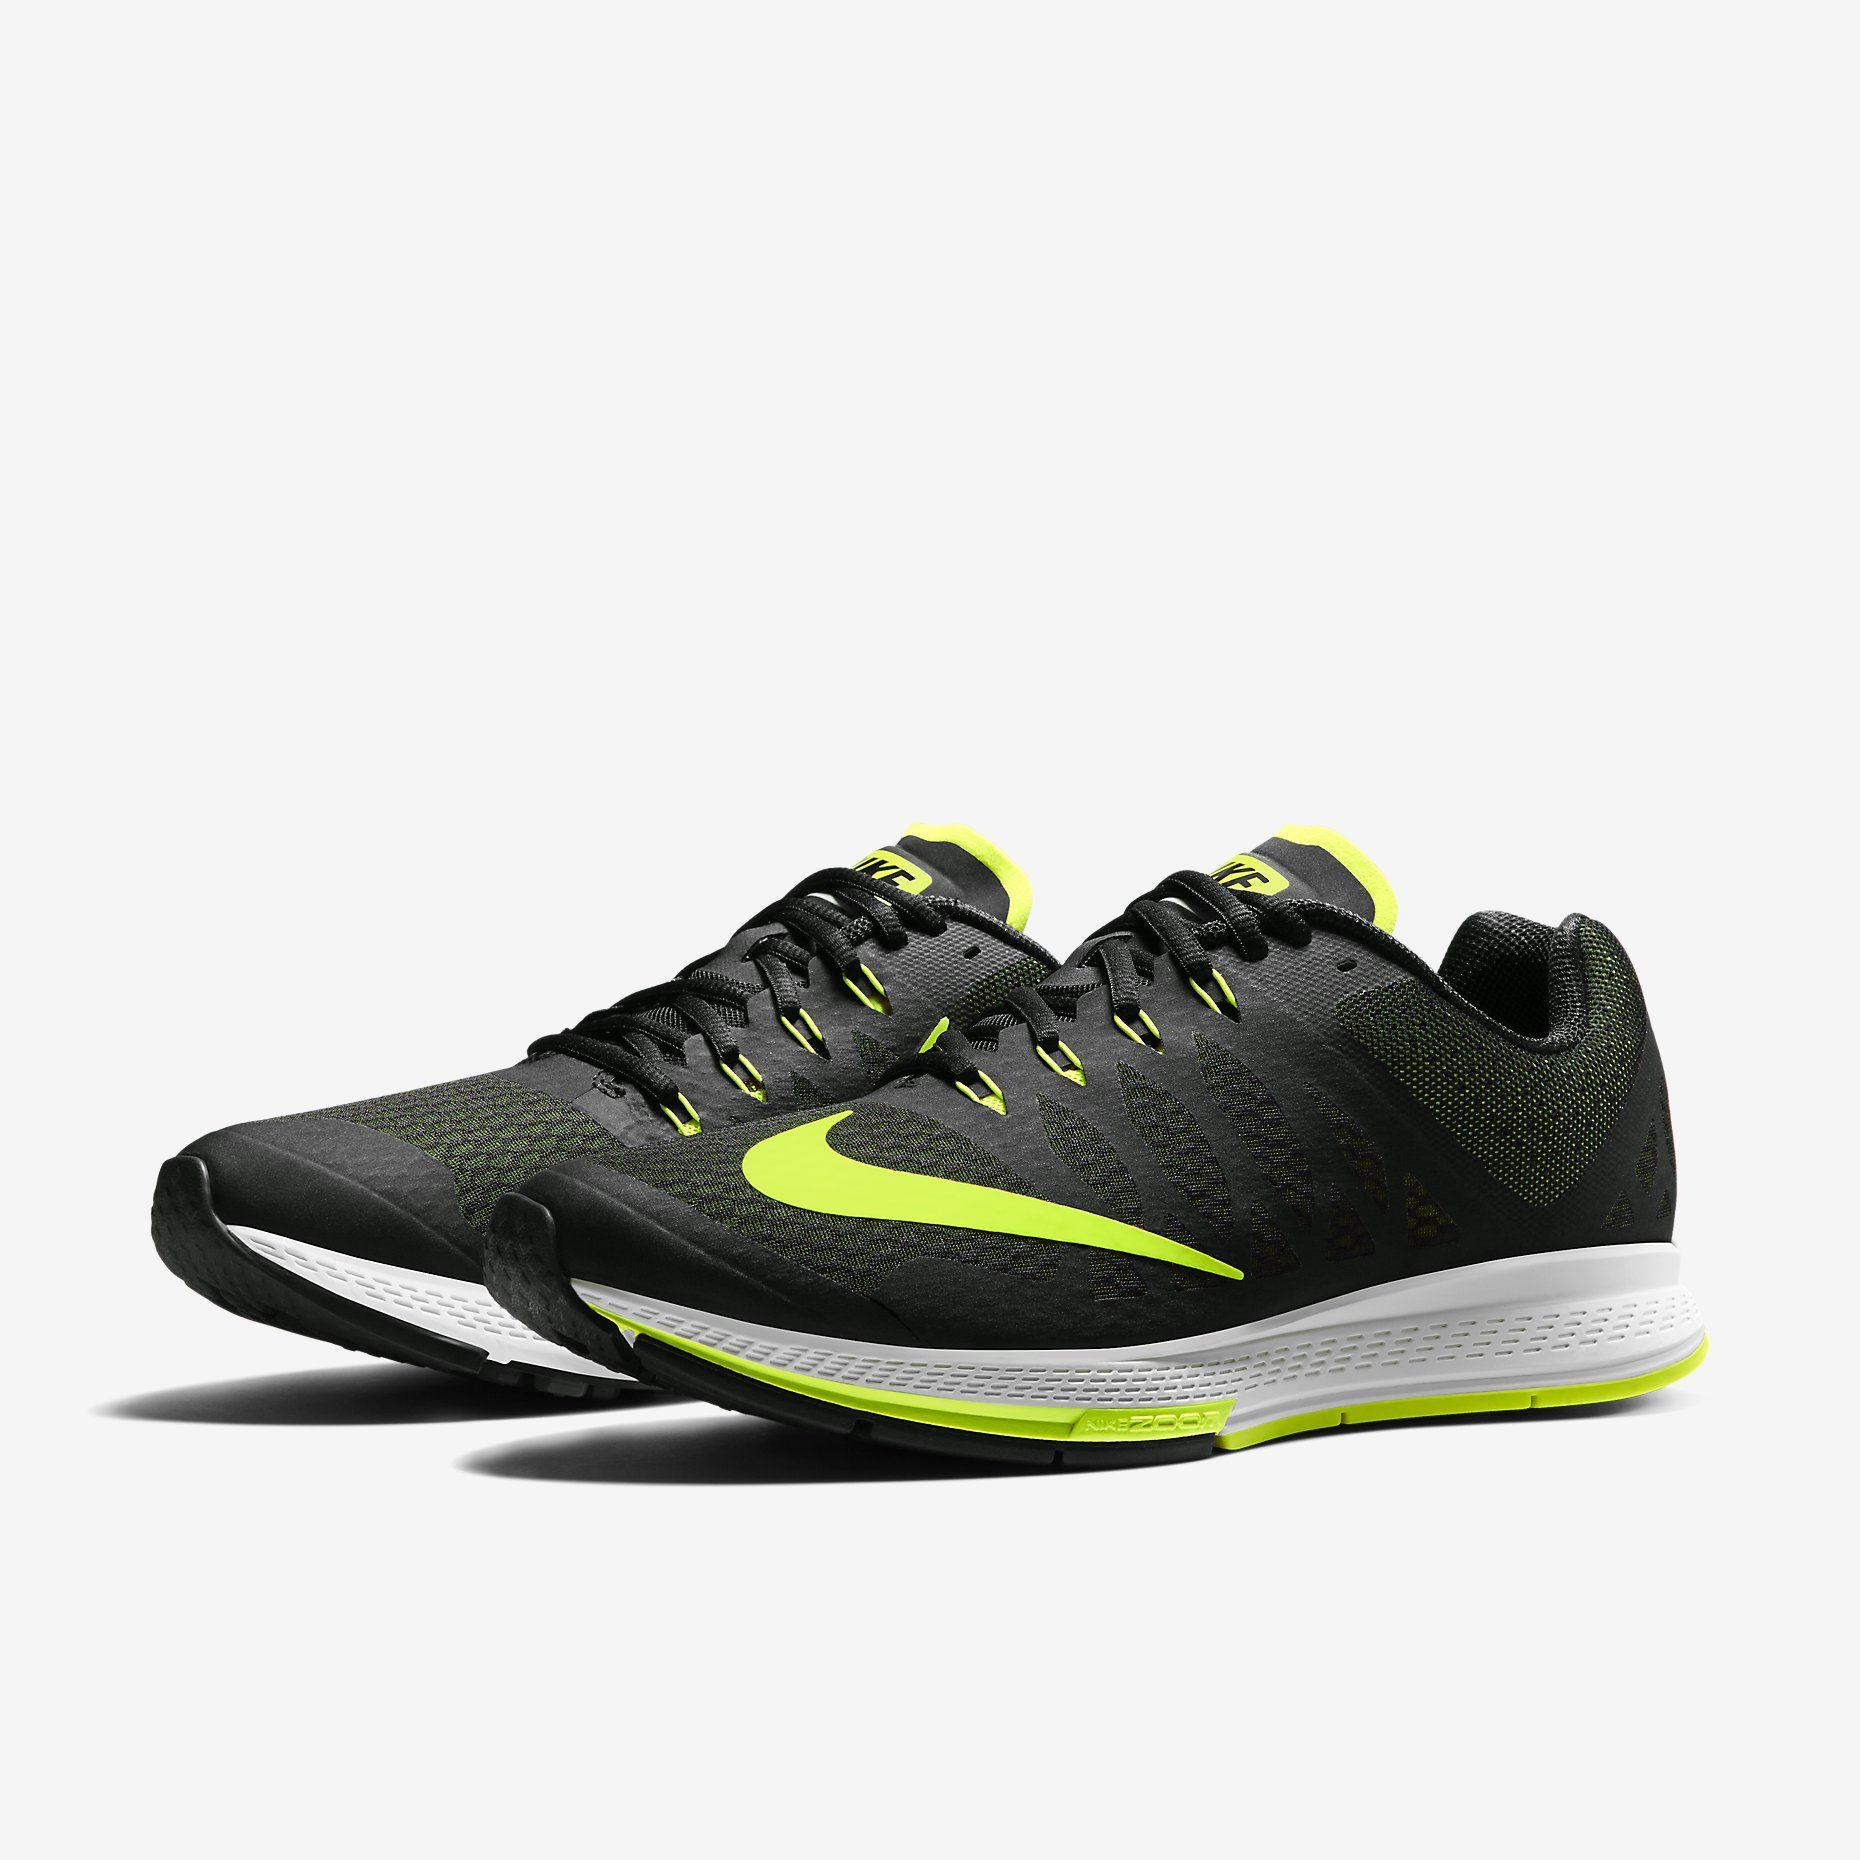 8e7b3a3a2c53 Nike Air Zoom Elite 7 Men s Running Shoe. Nike Store